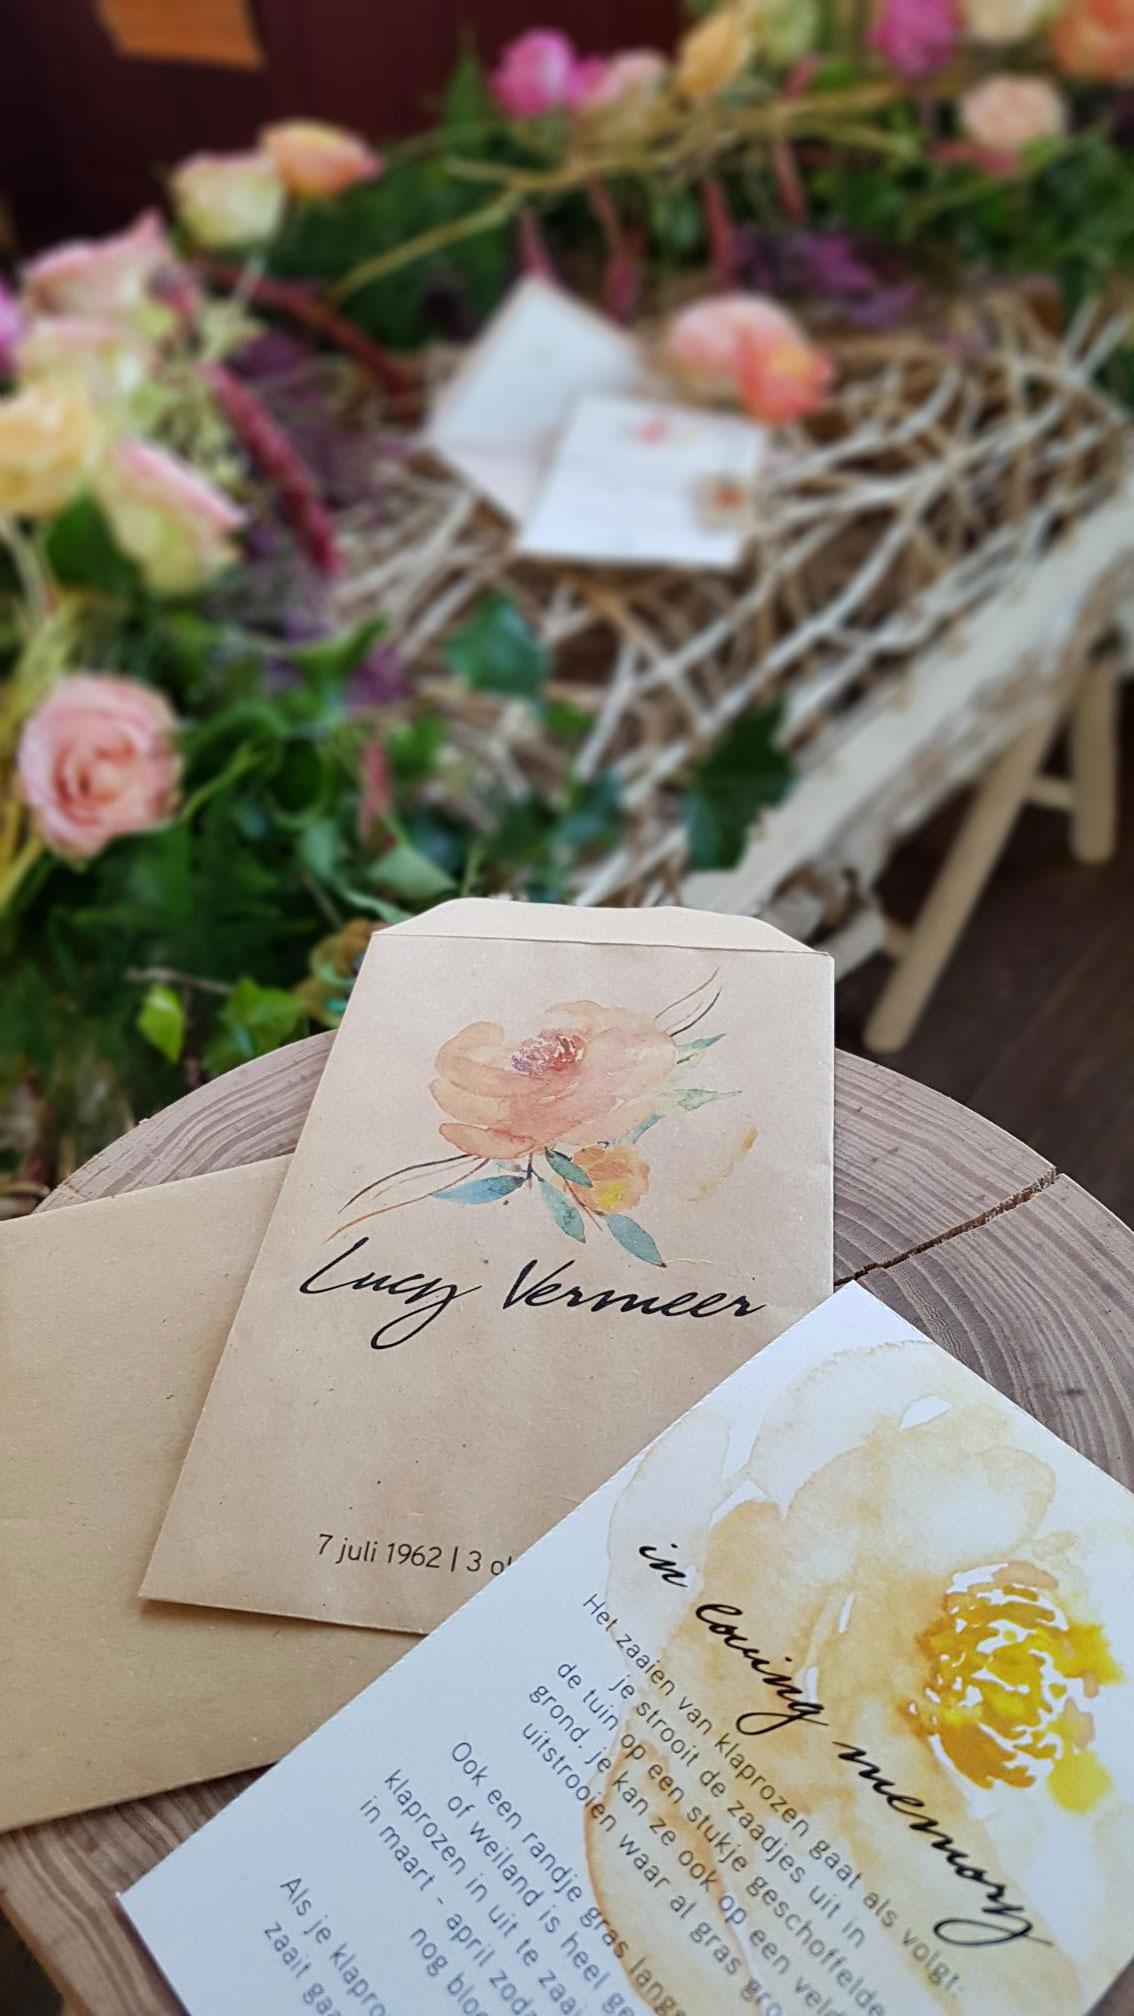 thankz-rouwbedankje-bloemzaadjes-vergeetmeniet